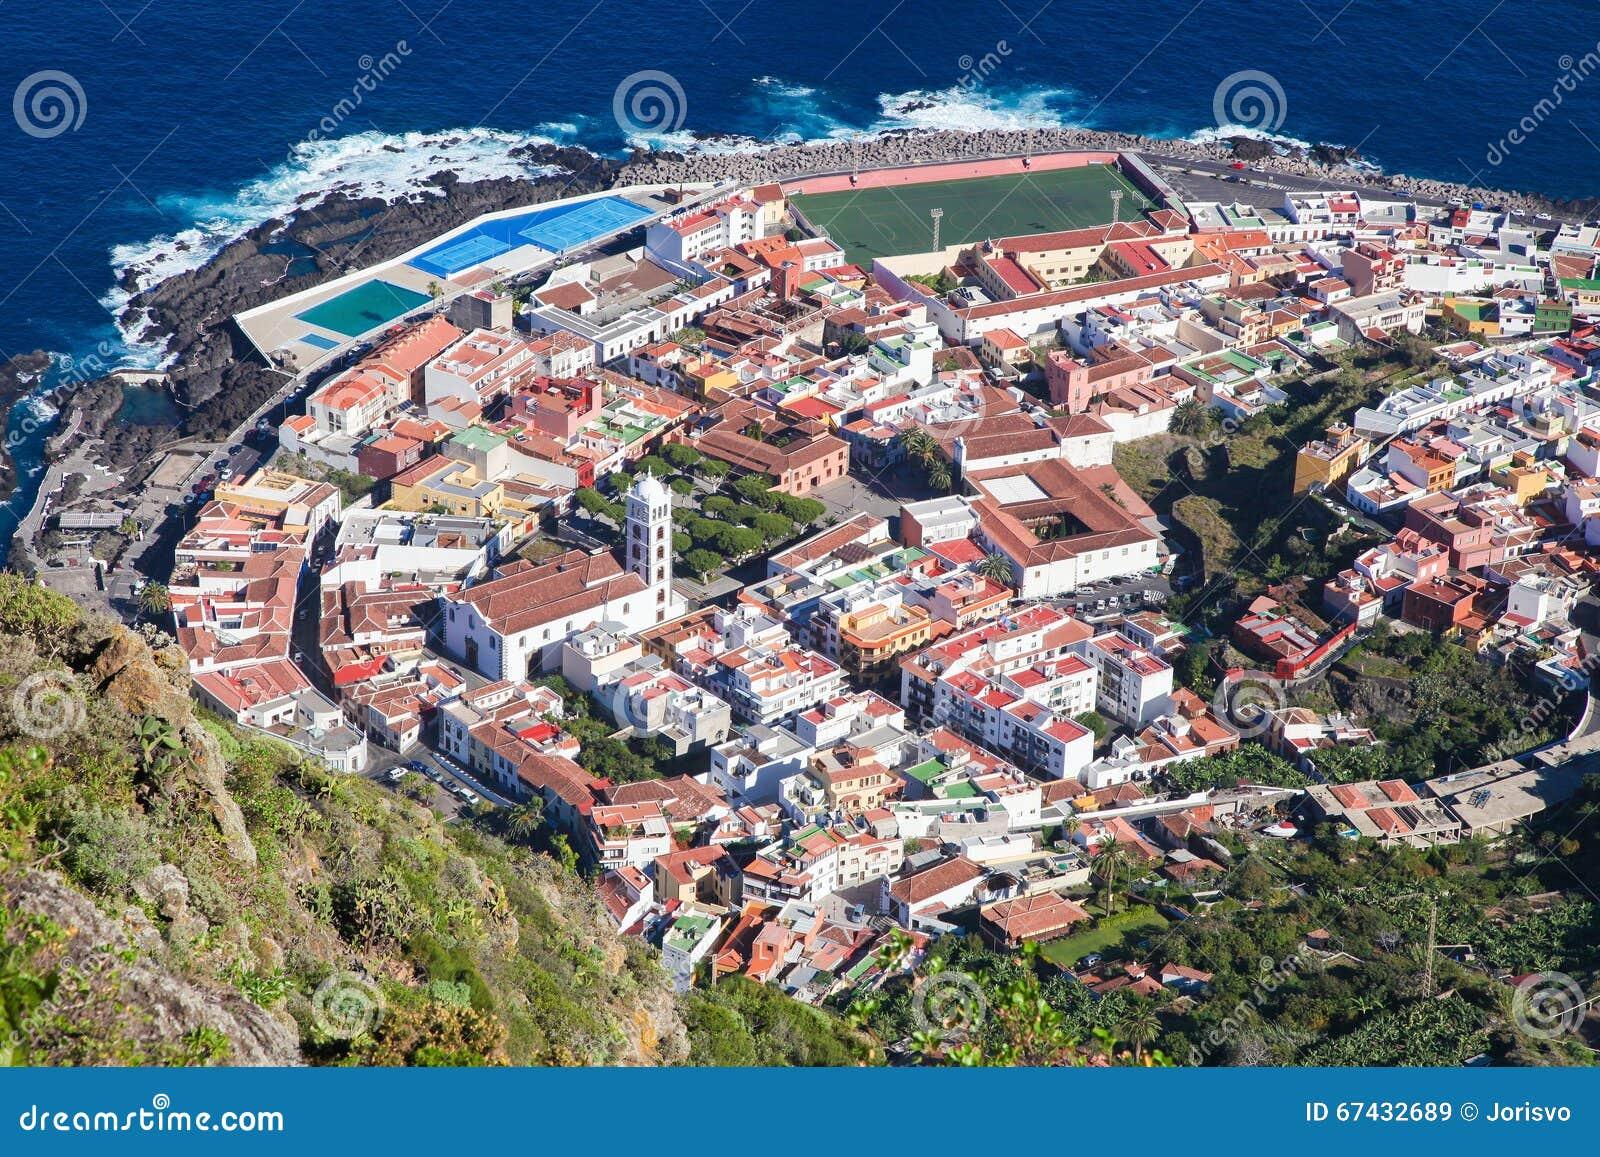 Garachico, Tenerife, Canary Islands, Spain